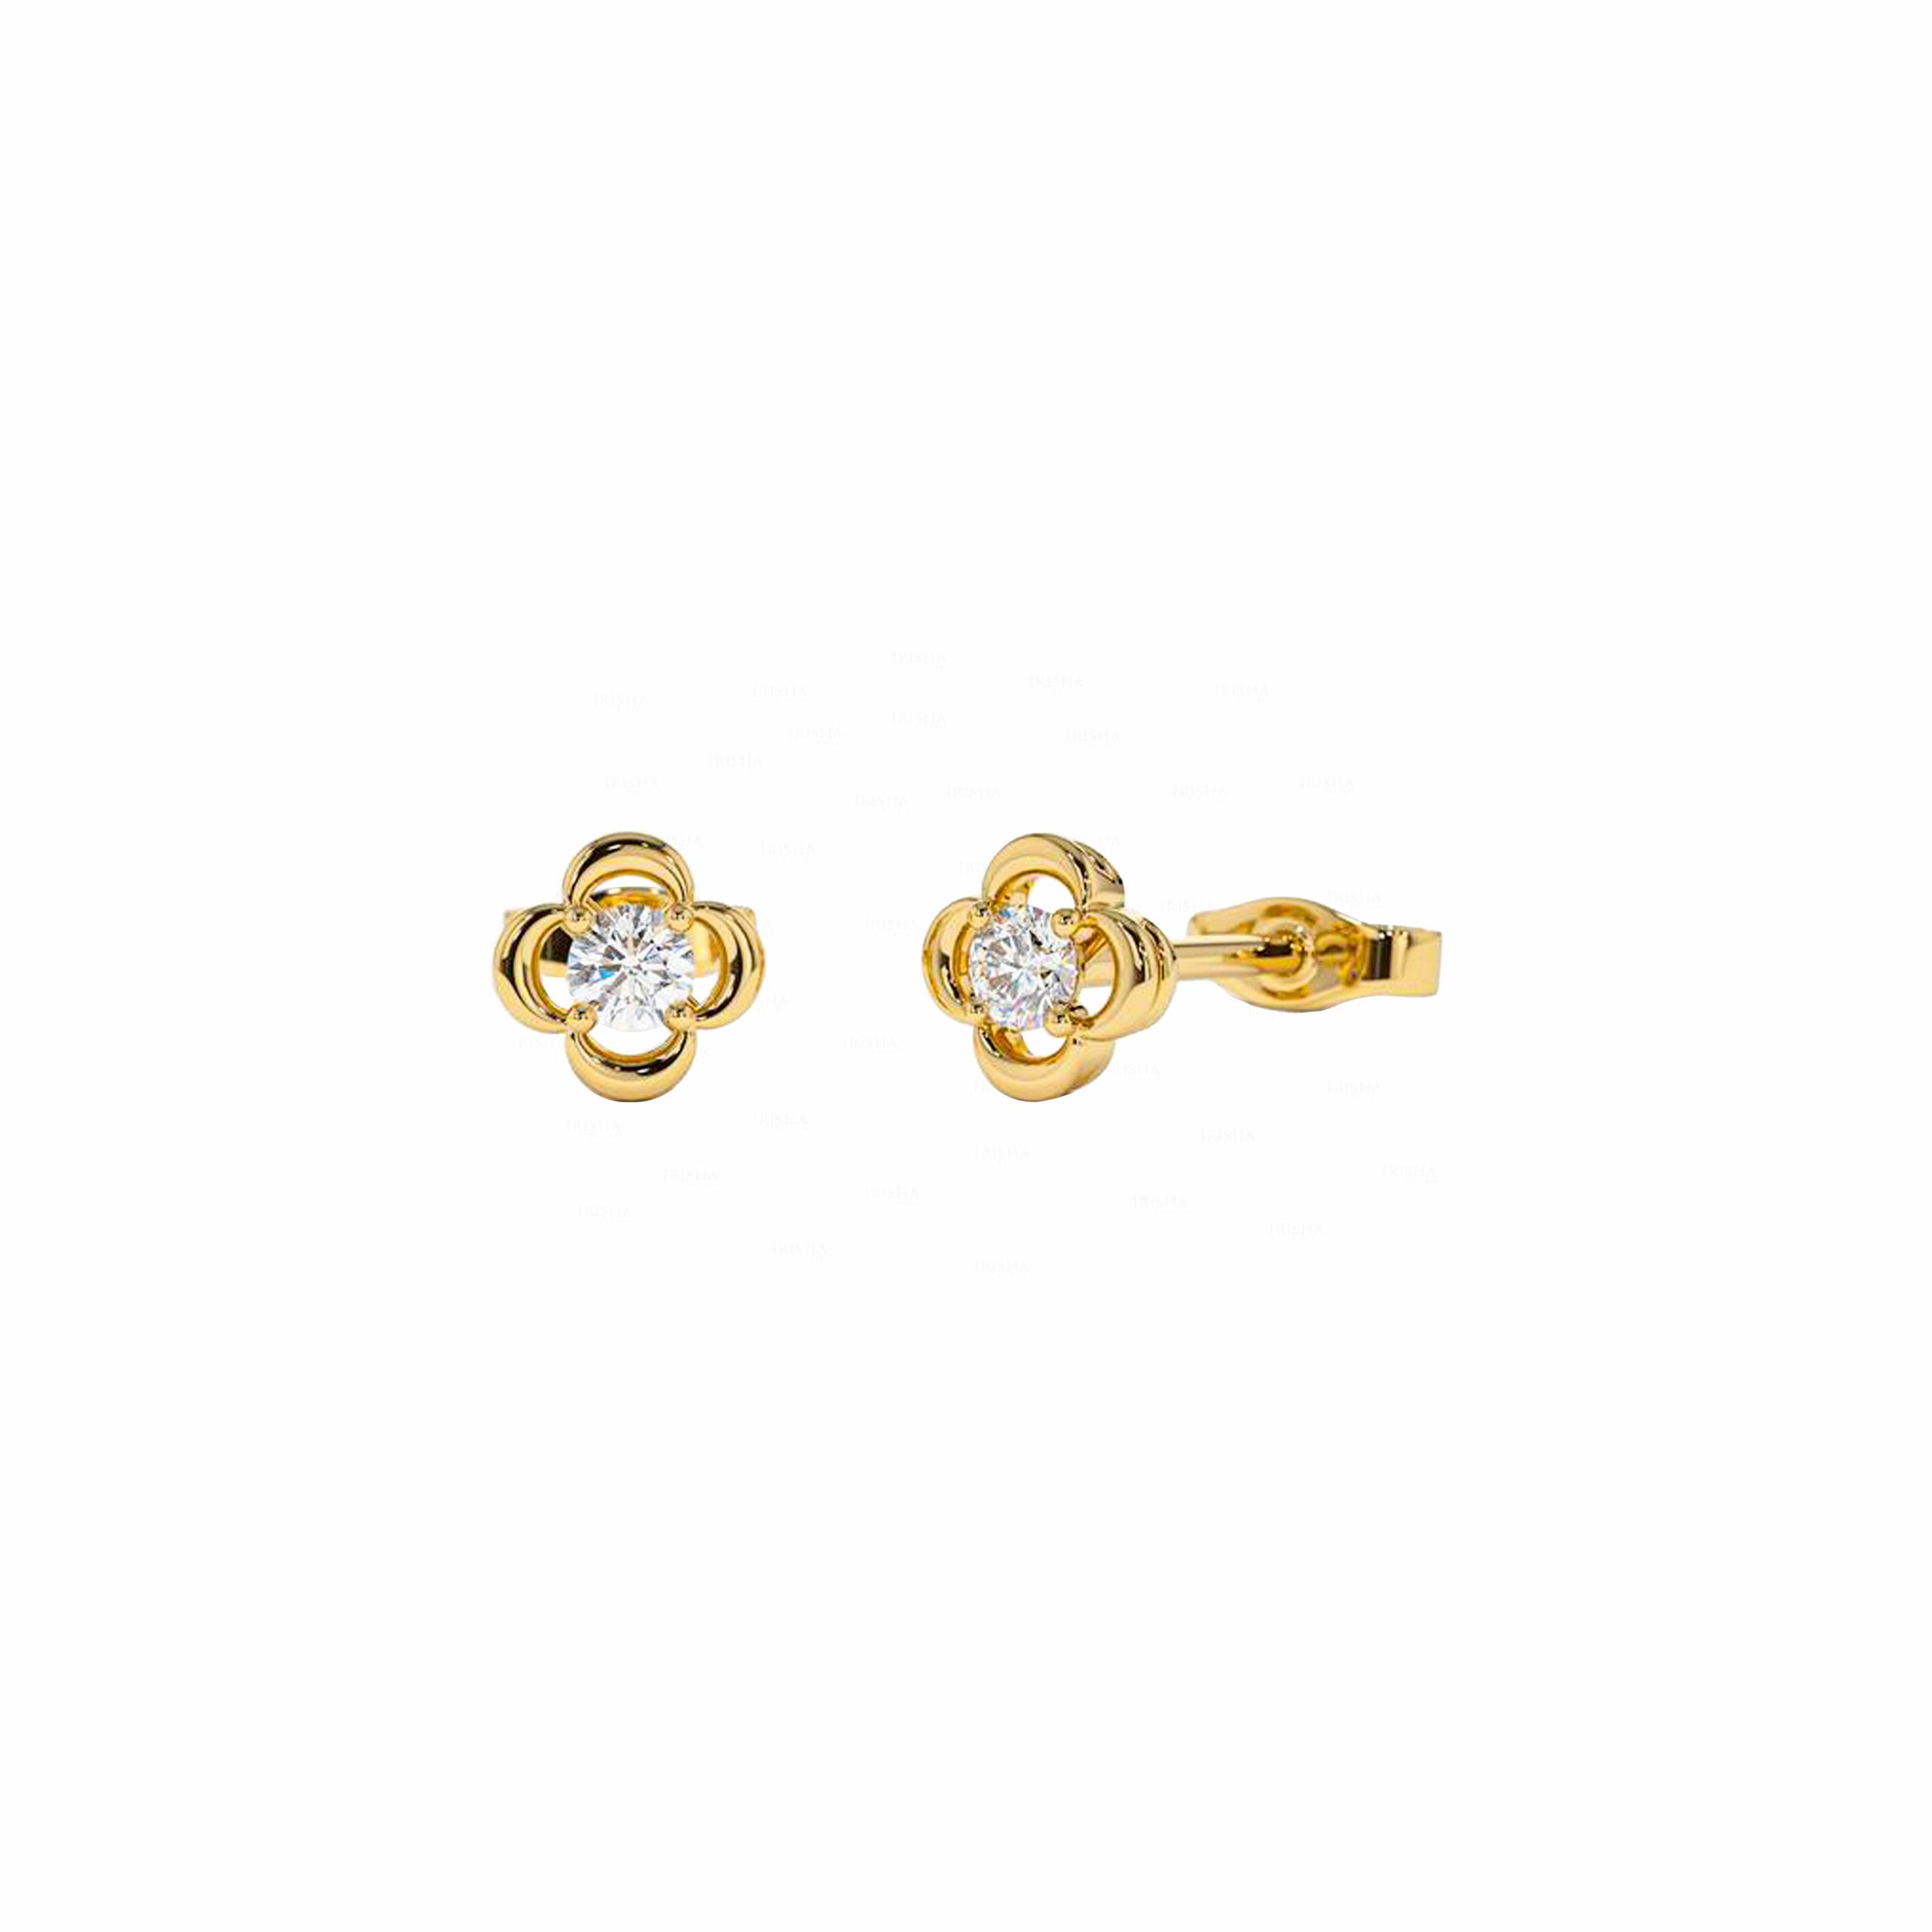 Four Petal Flower Studs | Floral Diamond Earrings